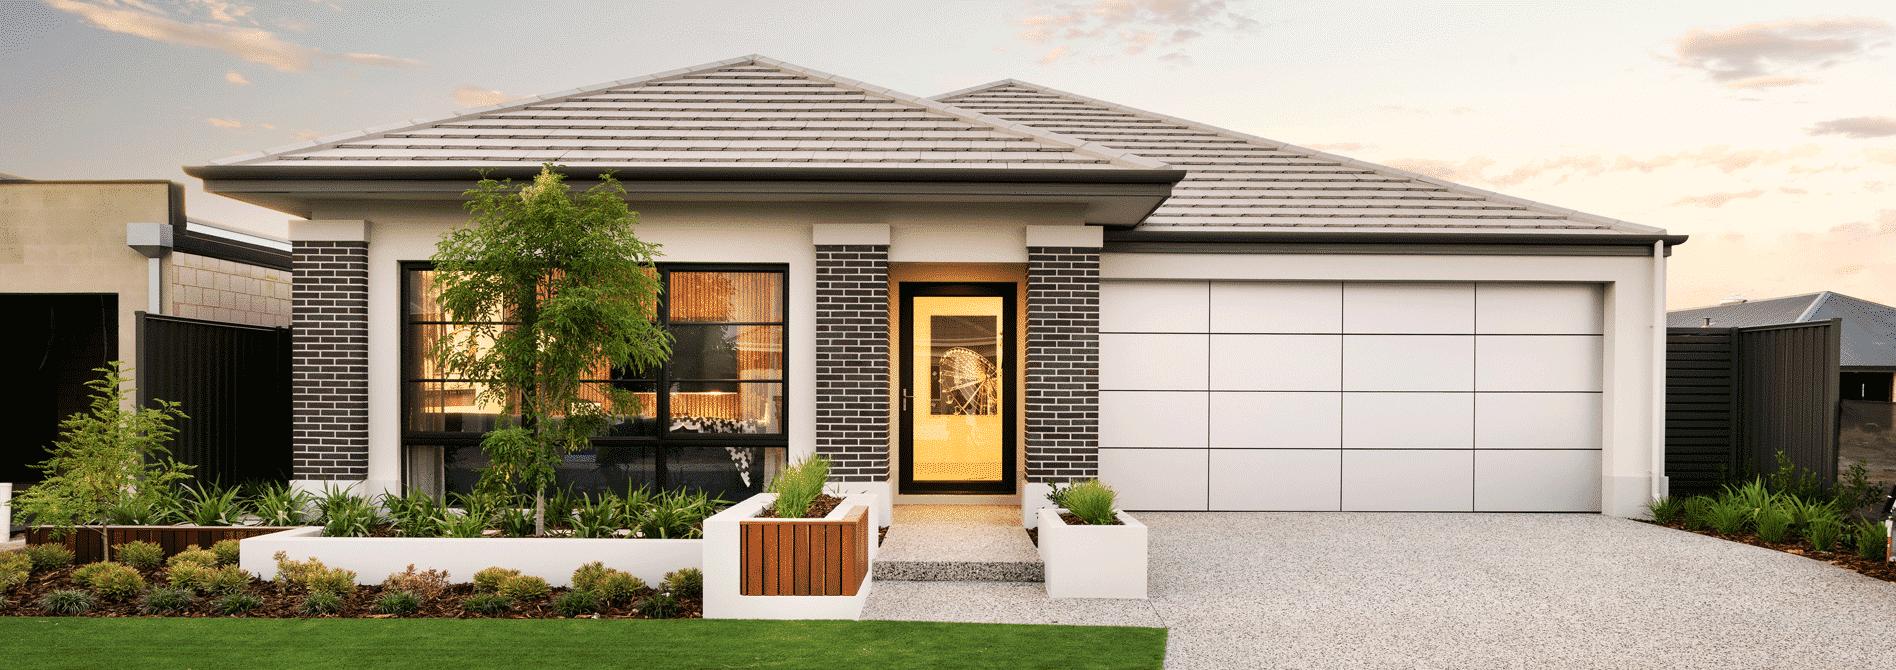 5 Great Ideas to Upgrade your Garage Door? - Specialized ...